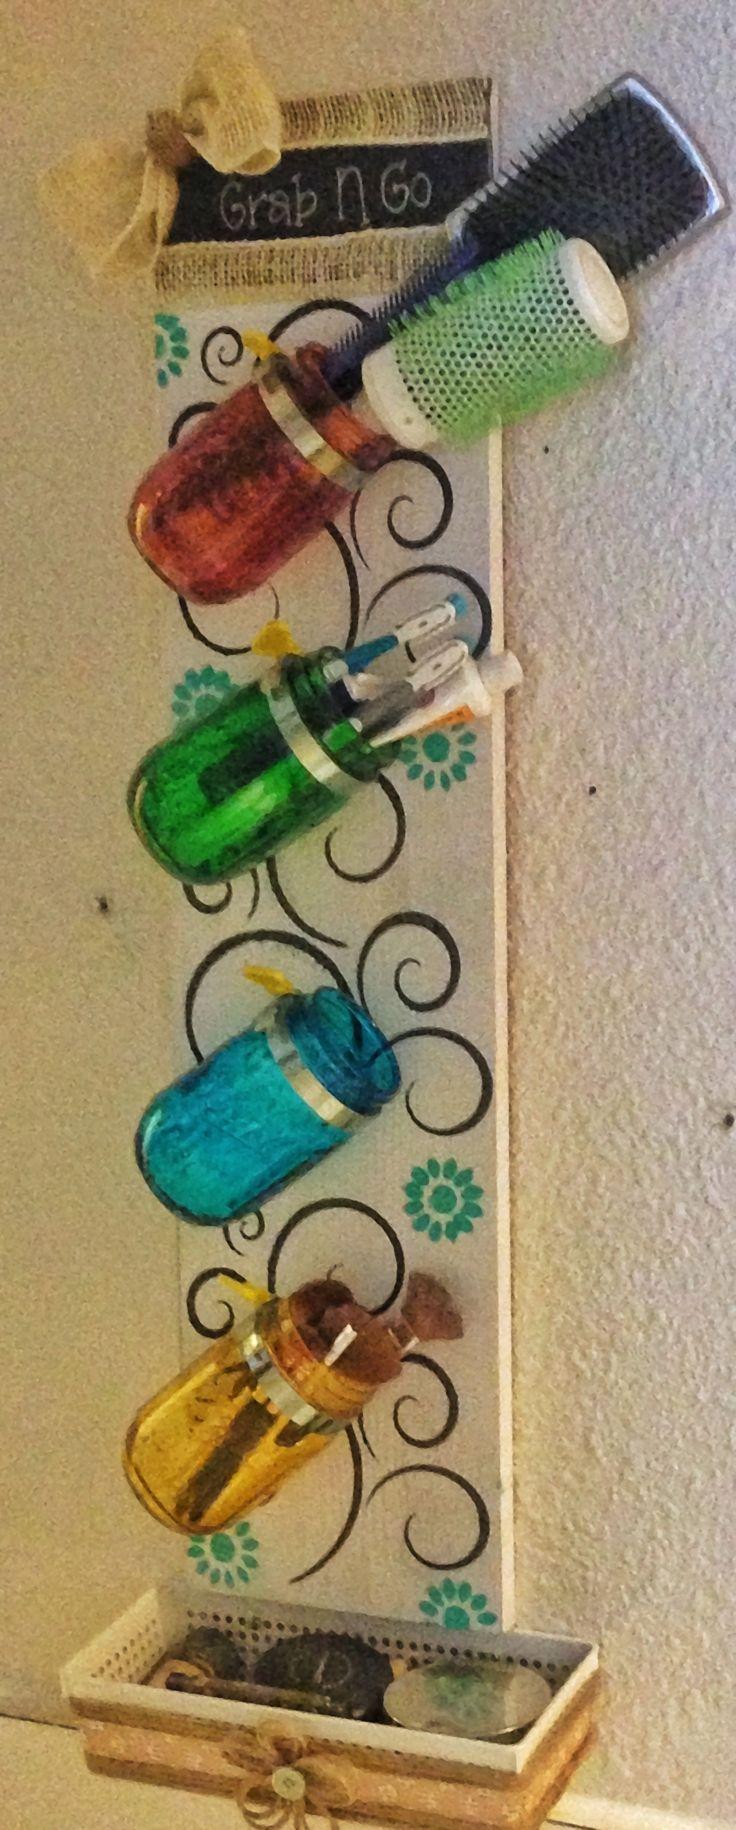 Stained mason jar, bathroom organizer I put together